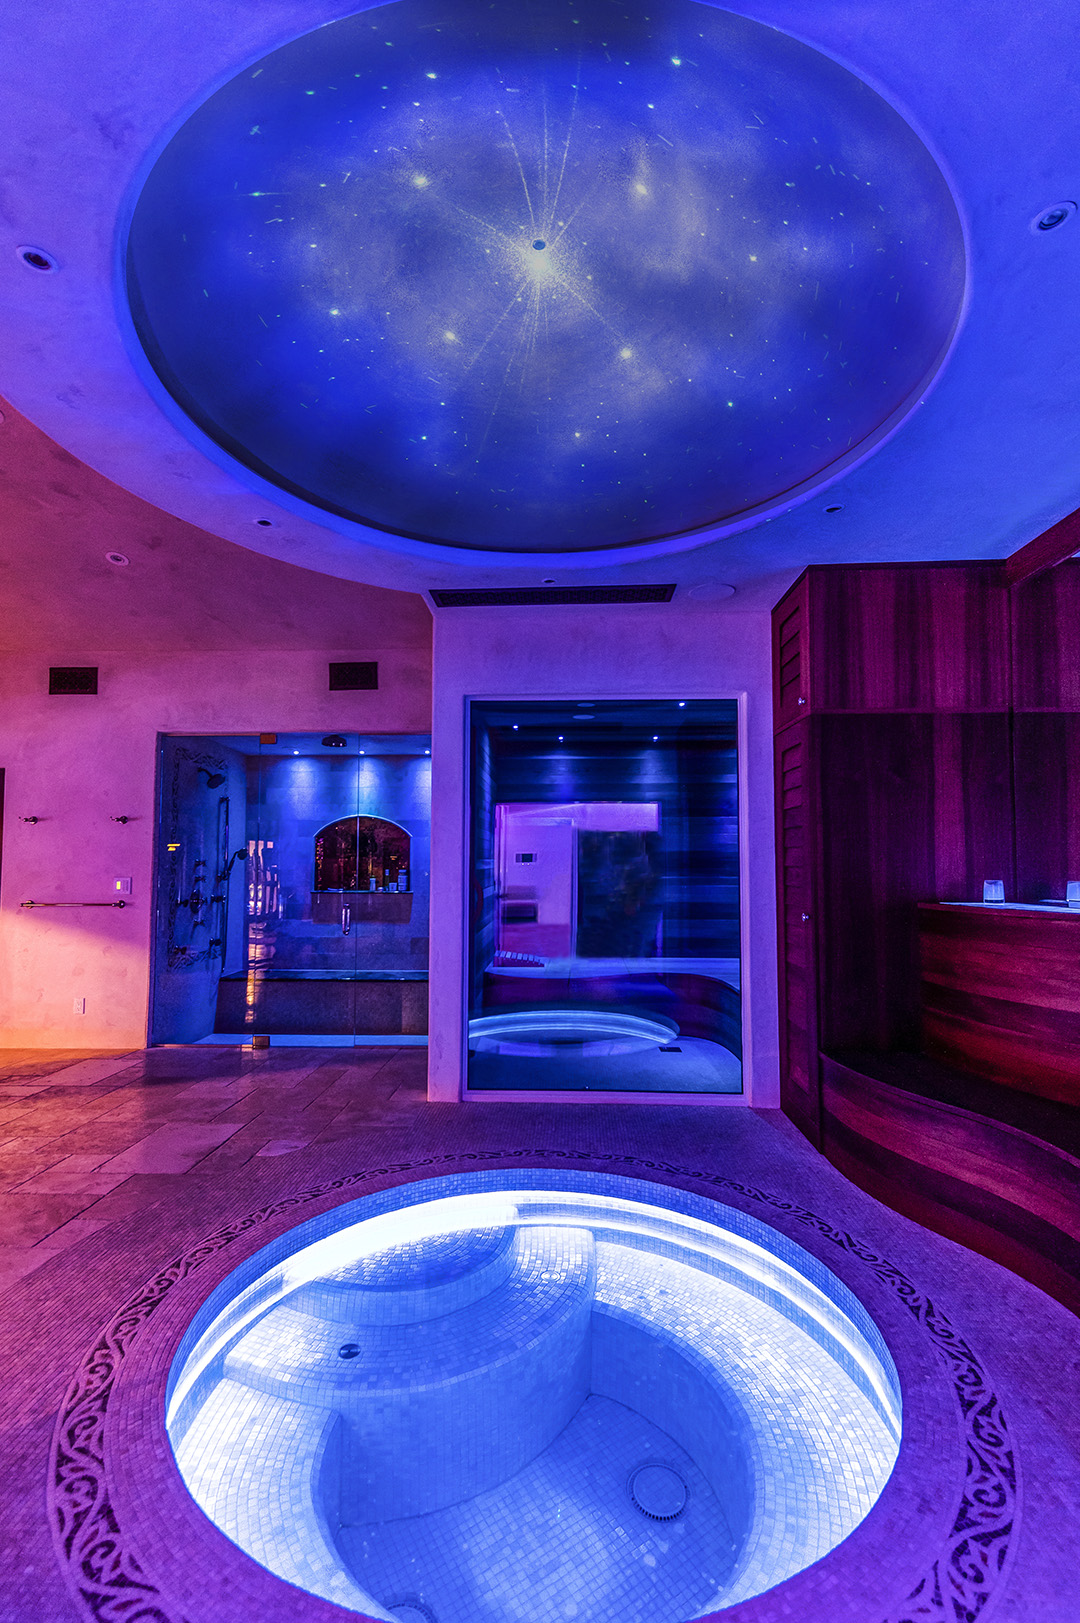 Night Sky Spa Dome.jpg